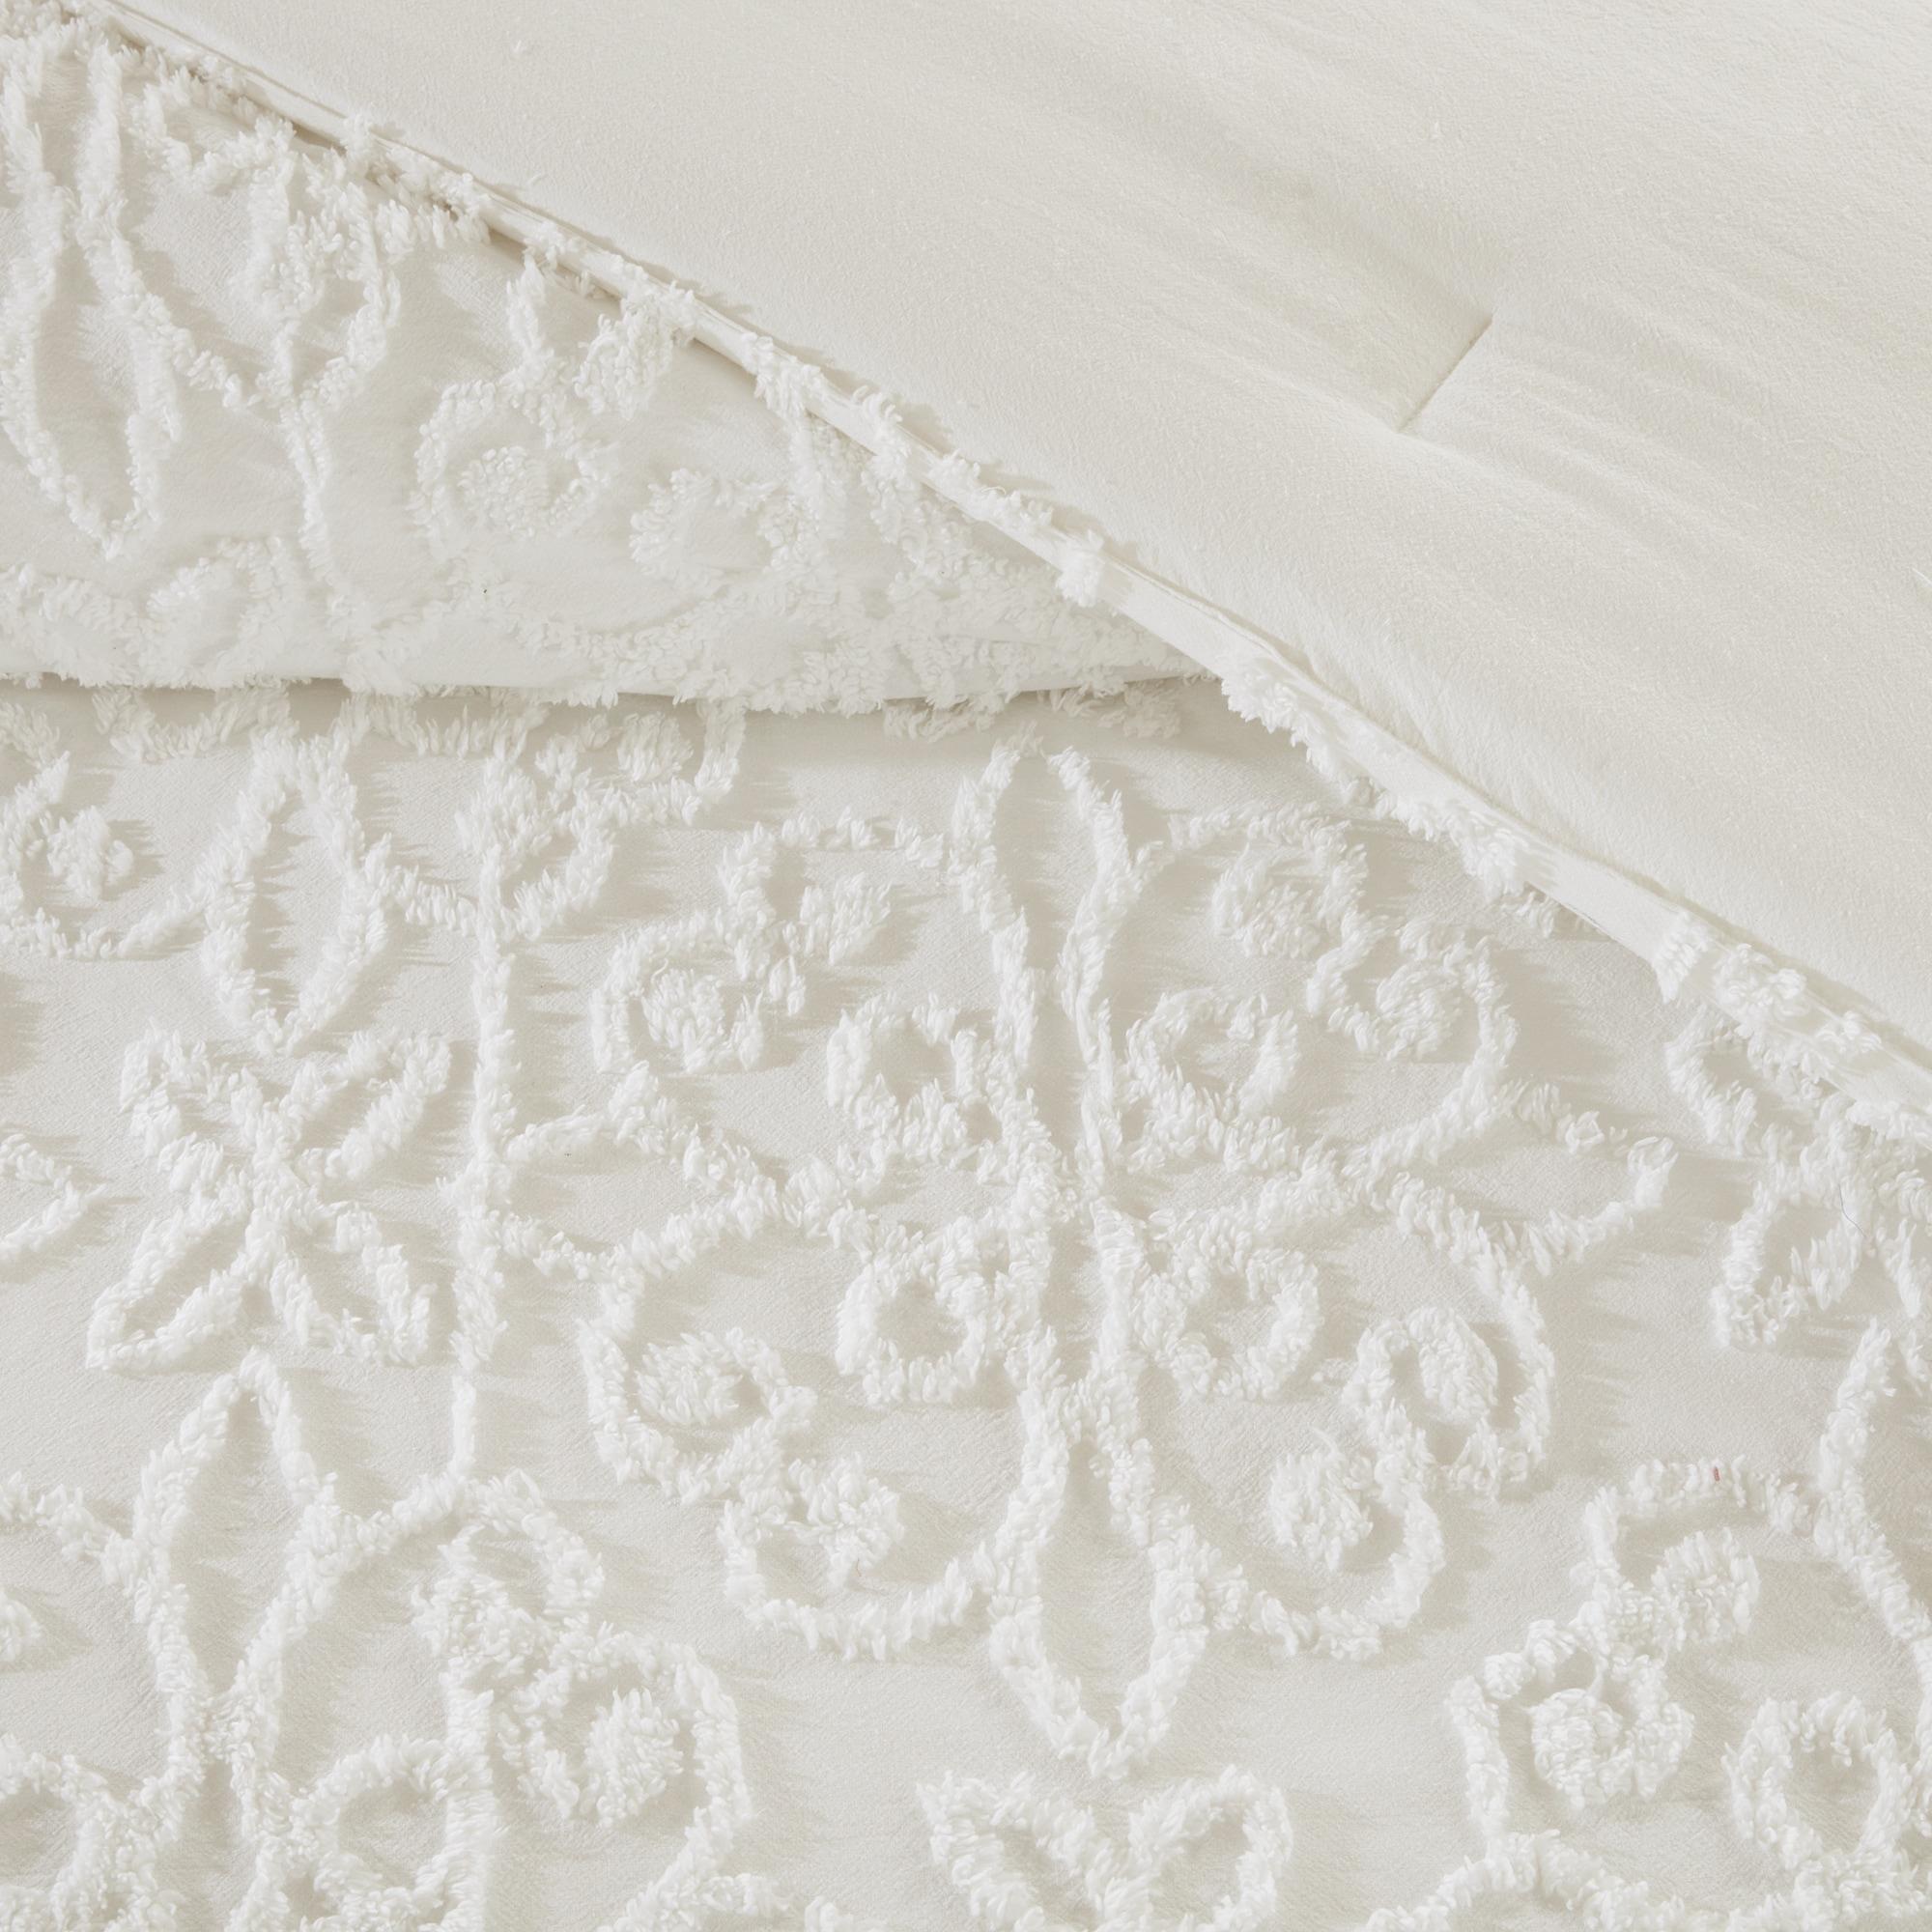 New Madison Park Sarah White Tufted Comforter 4 Piece Set Full/ Queen  OV29